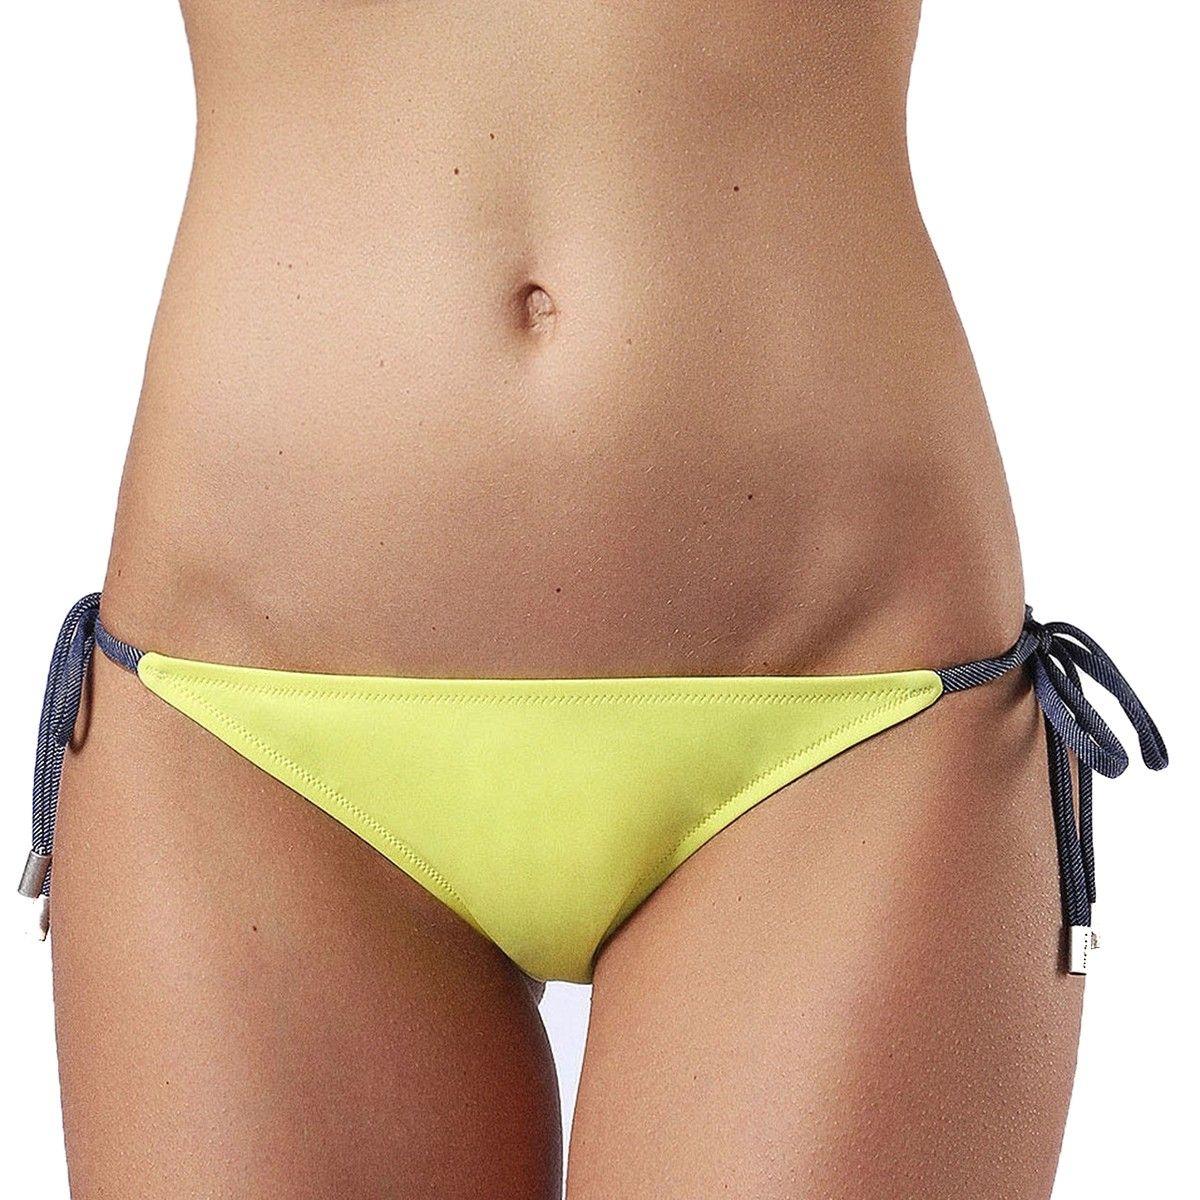 Bas de maillot de bain bicolore ajustable Brigittes